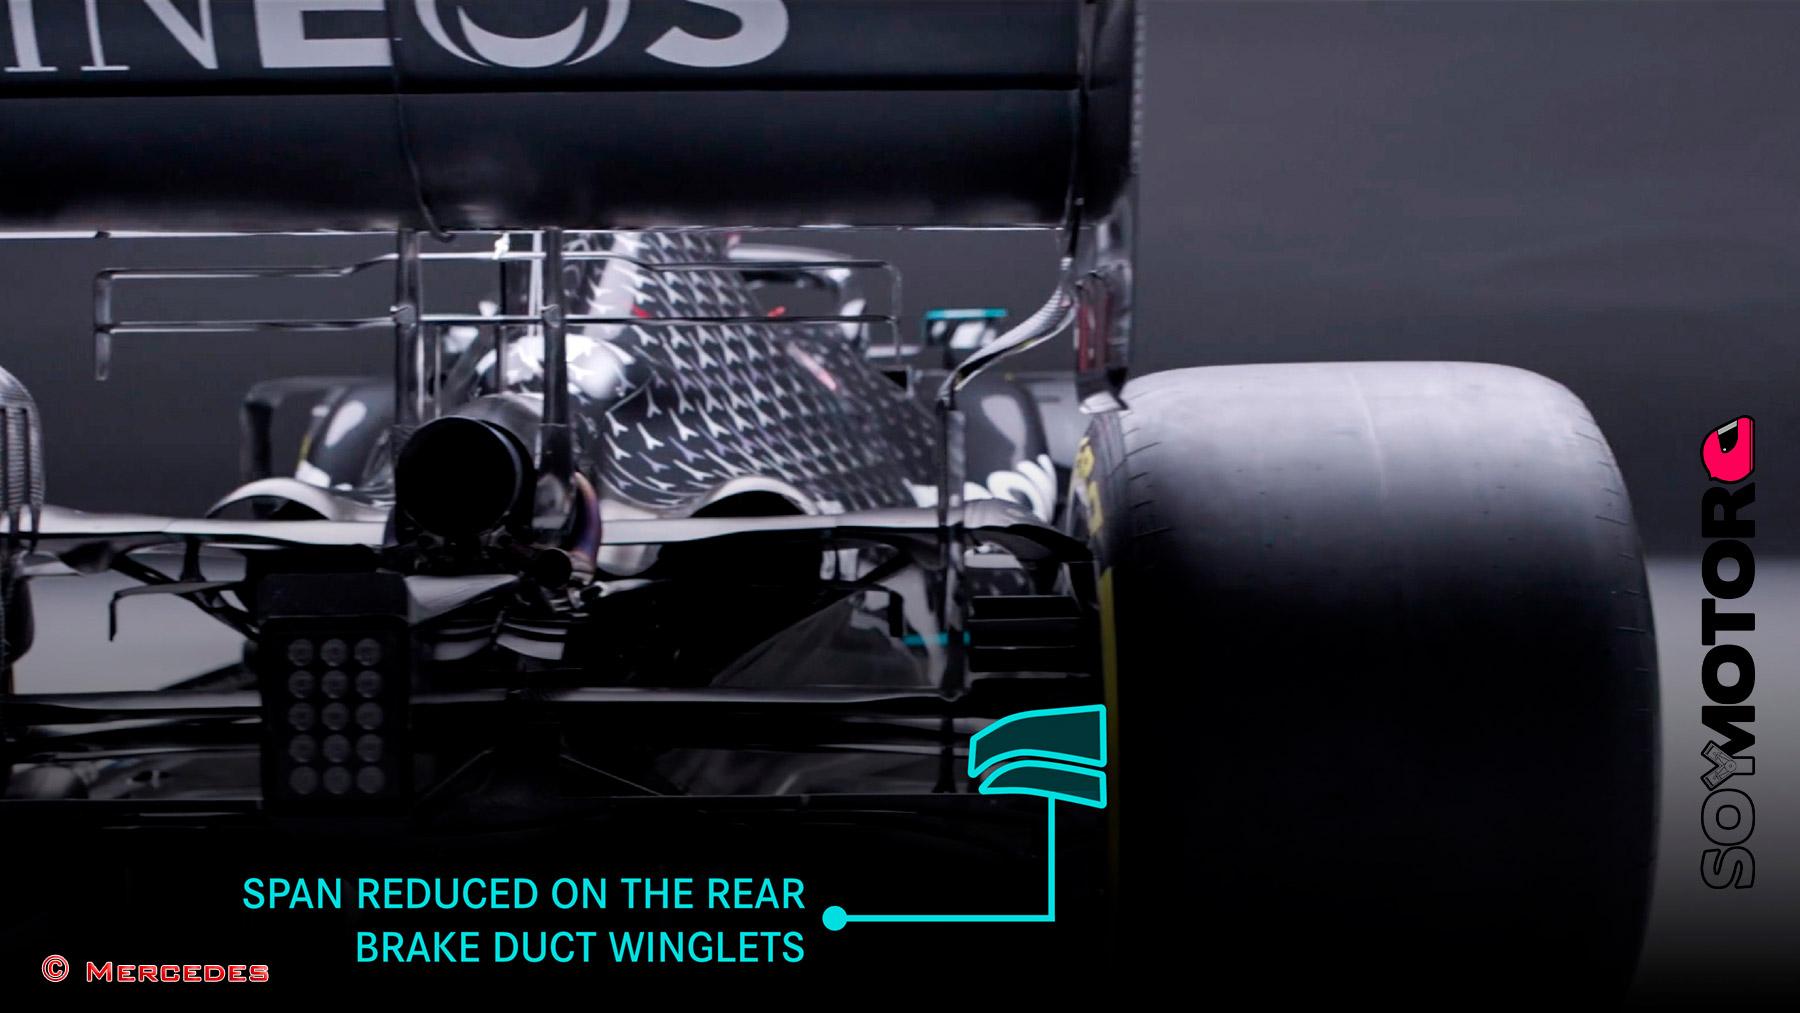 mercedes-aerodinamica-frenos-traseros-soymotor.jpg